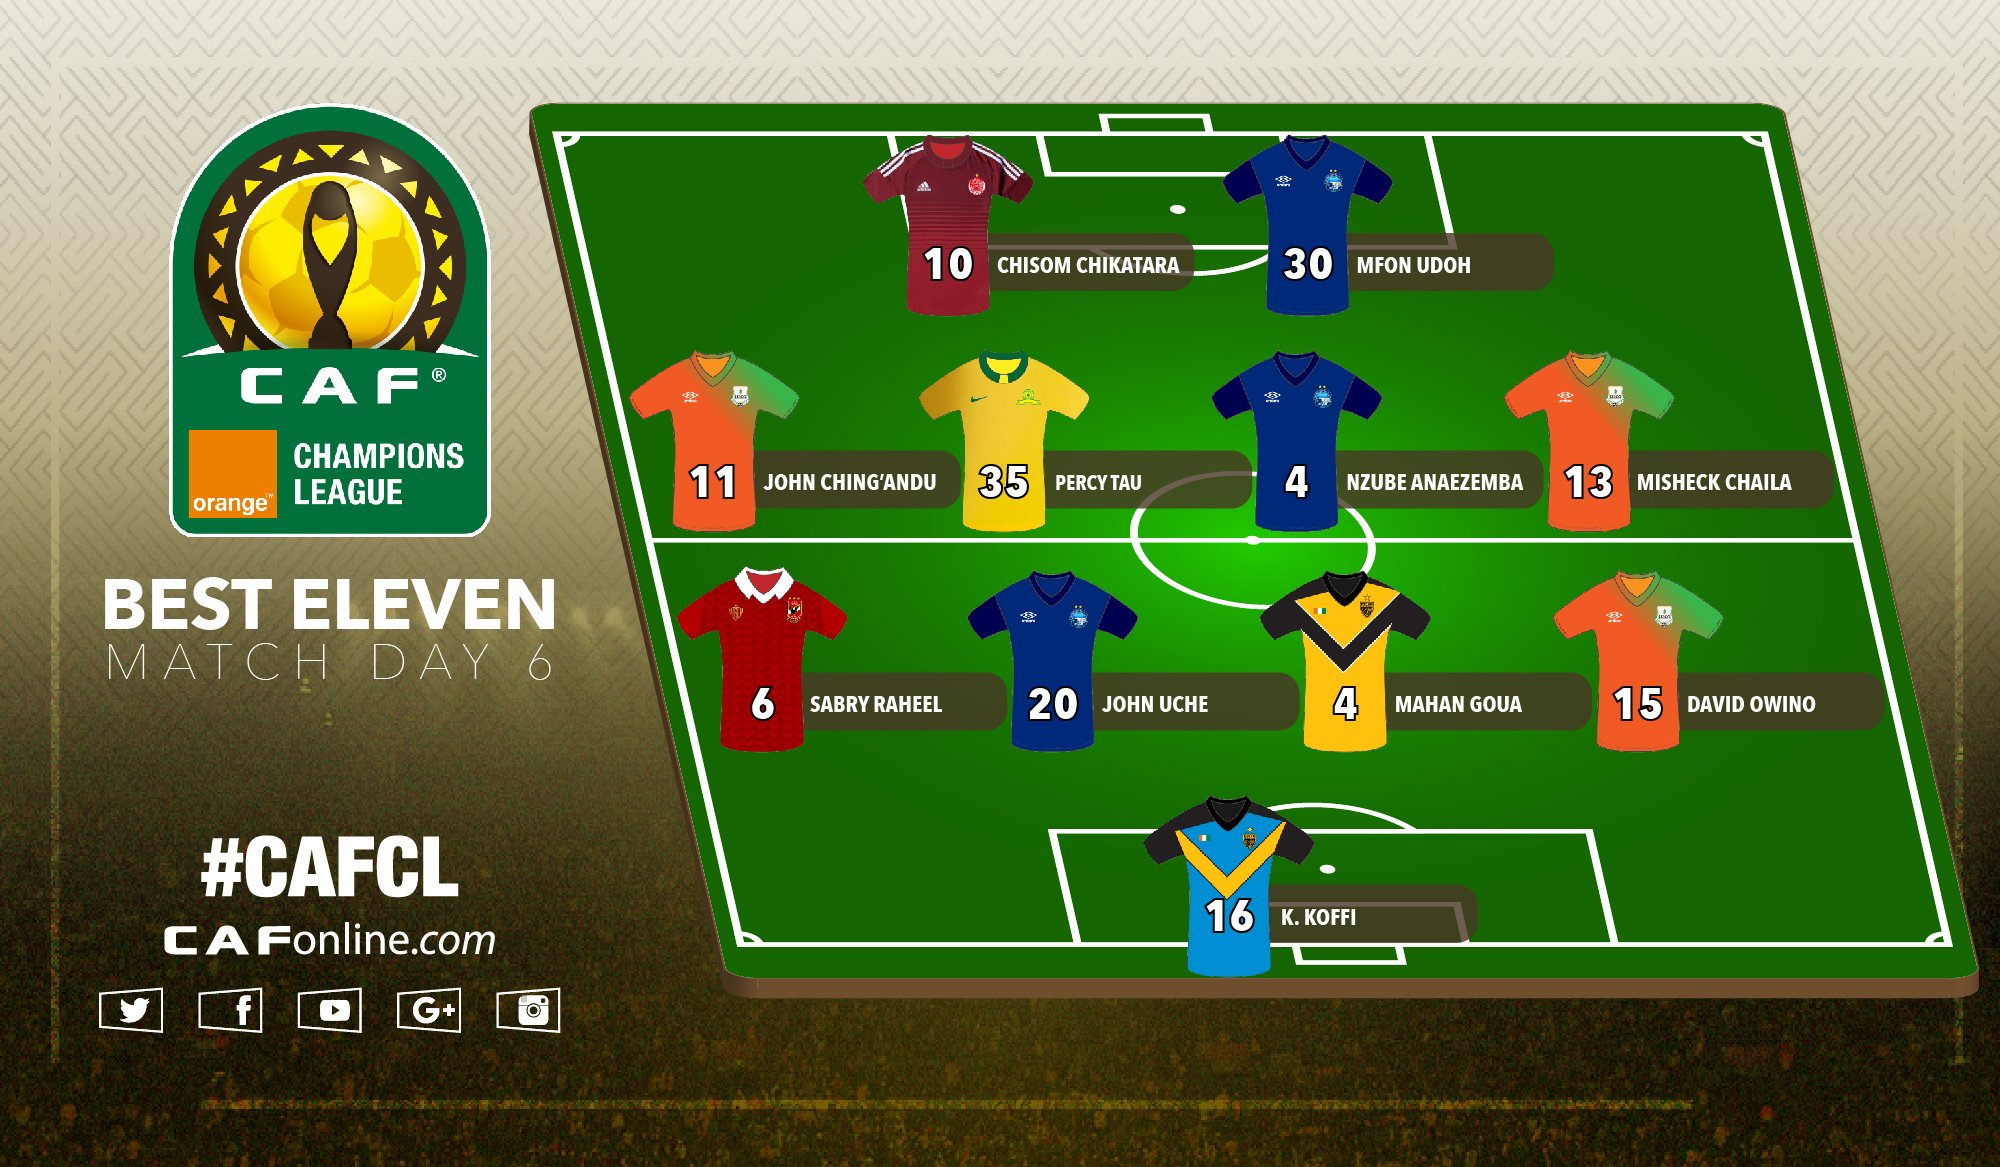 Chikatara, 3 Enyimba Stars Make CAFCL Matchday 6 Best XI